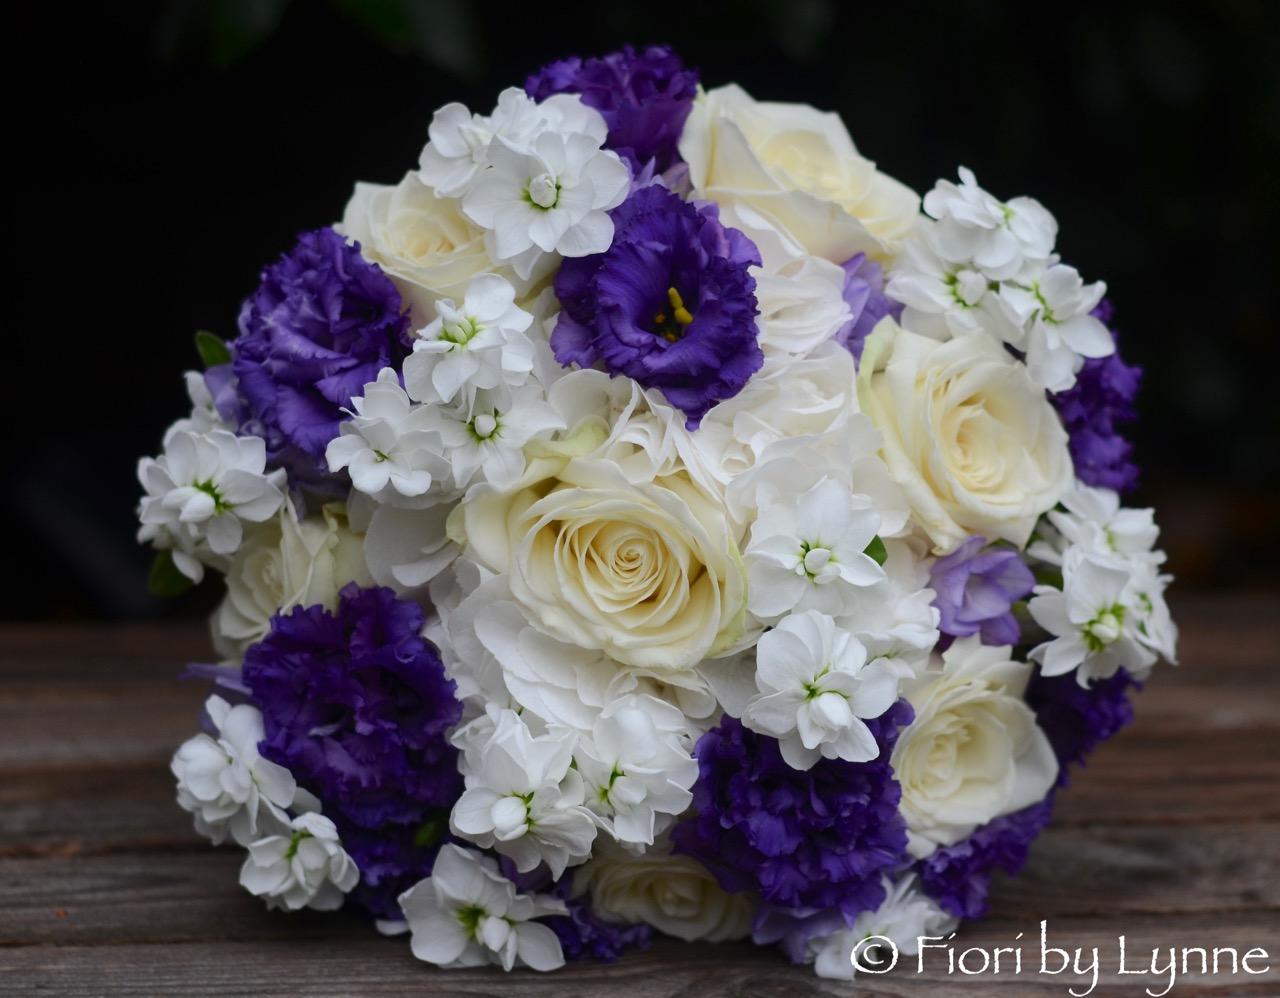 Wedding flowers blog hannah and stuarts classic purple and white hannah and stuarts classic purple and white wedding flowers rhinefield house mightylinksfo